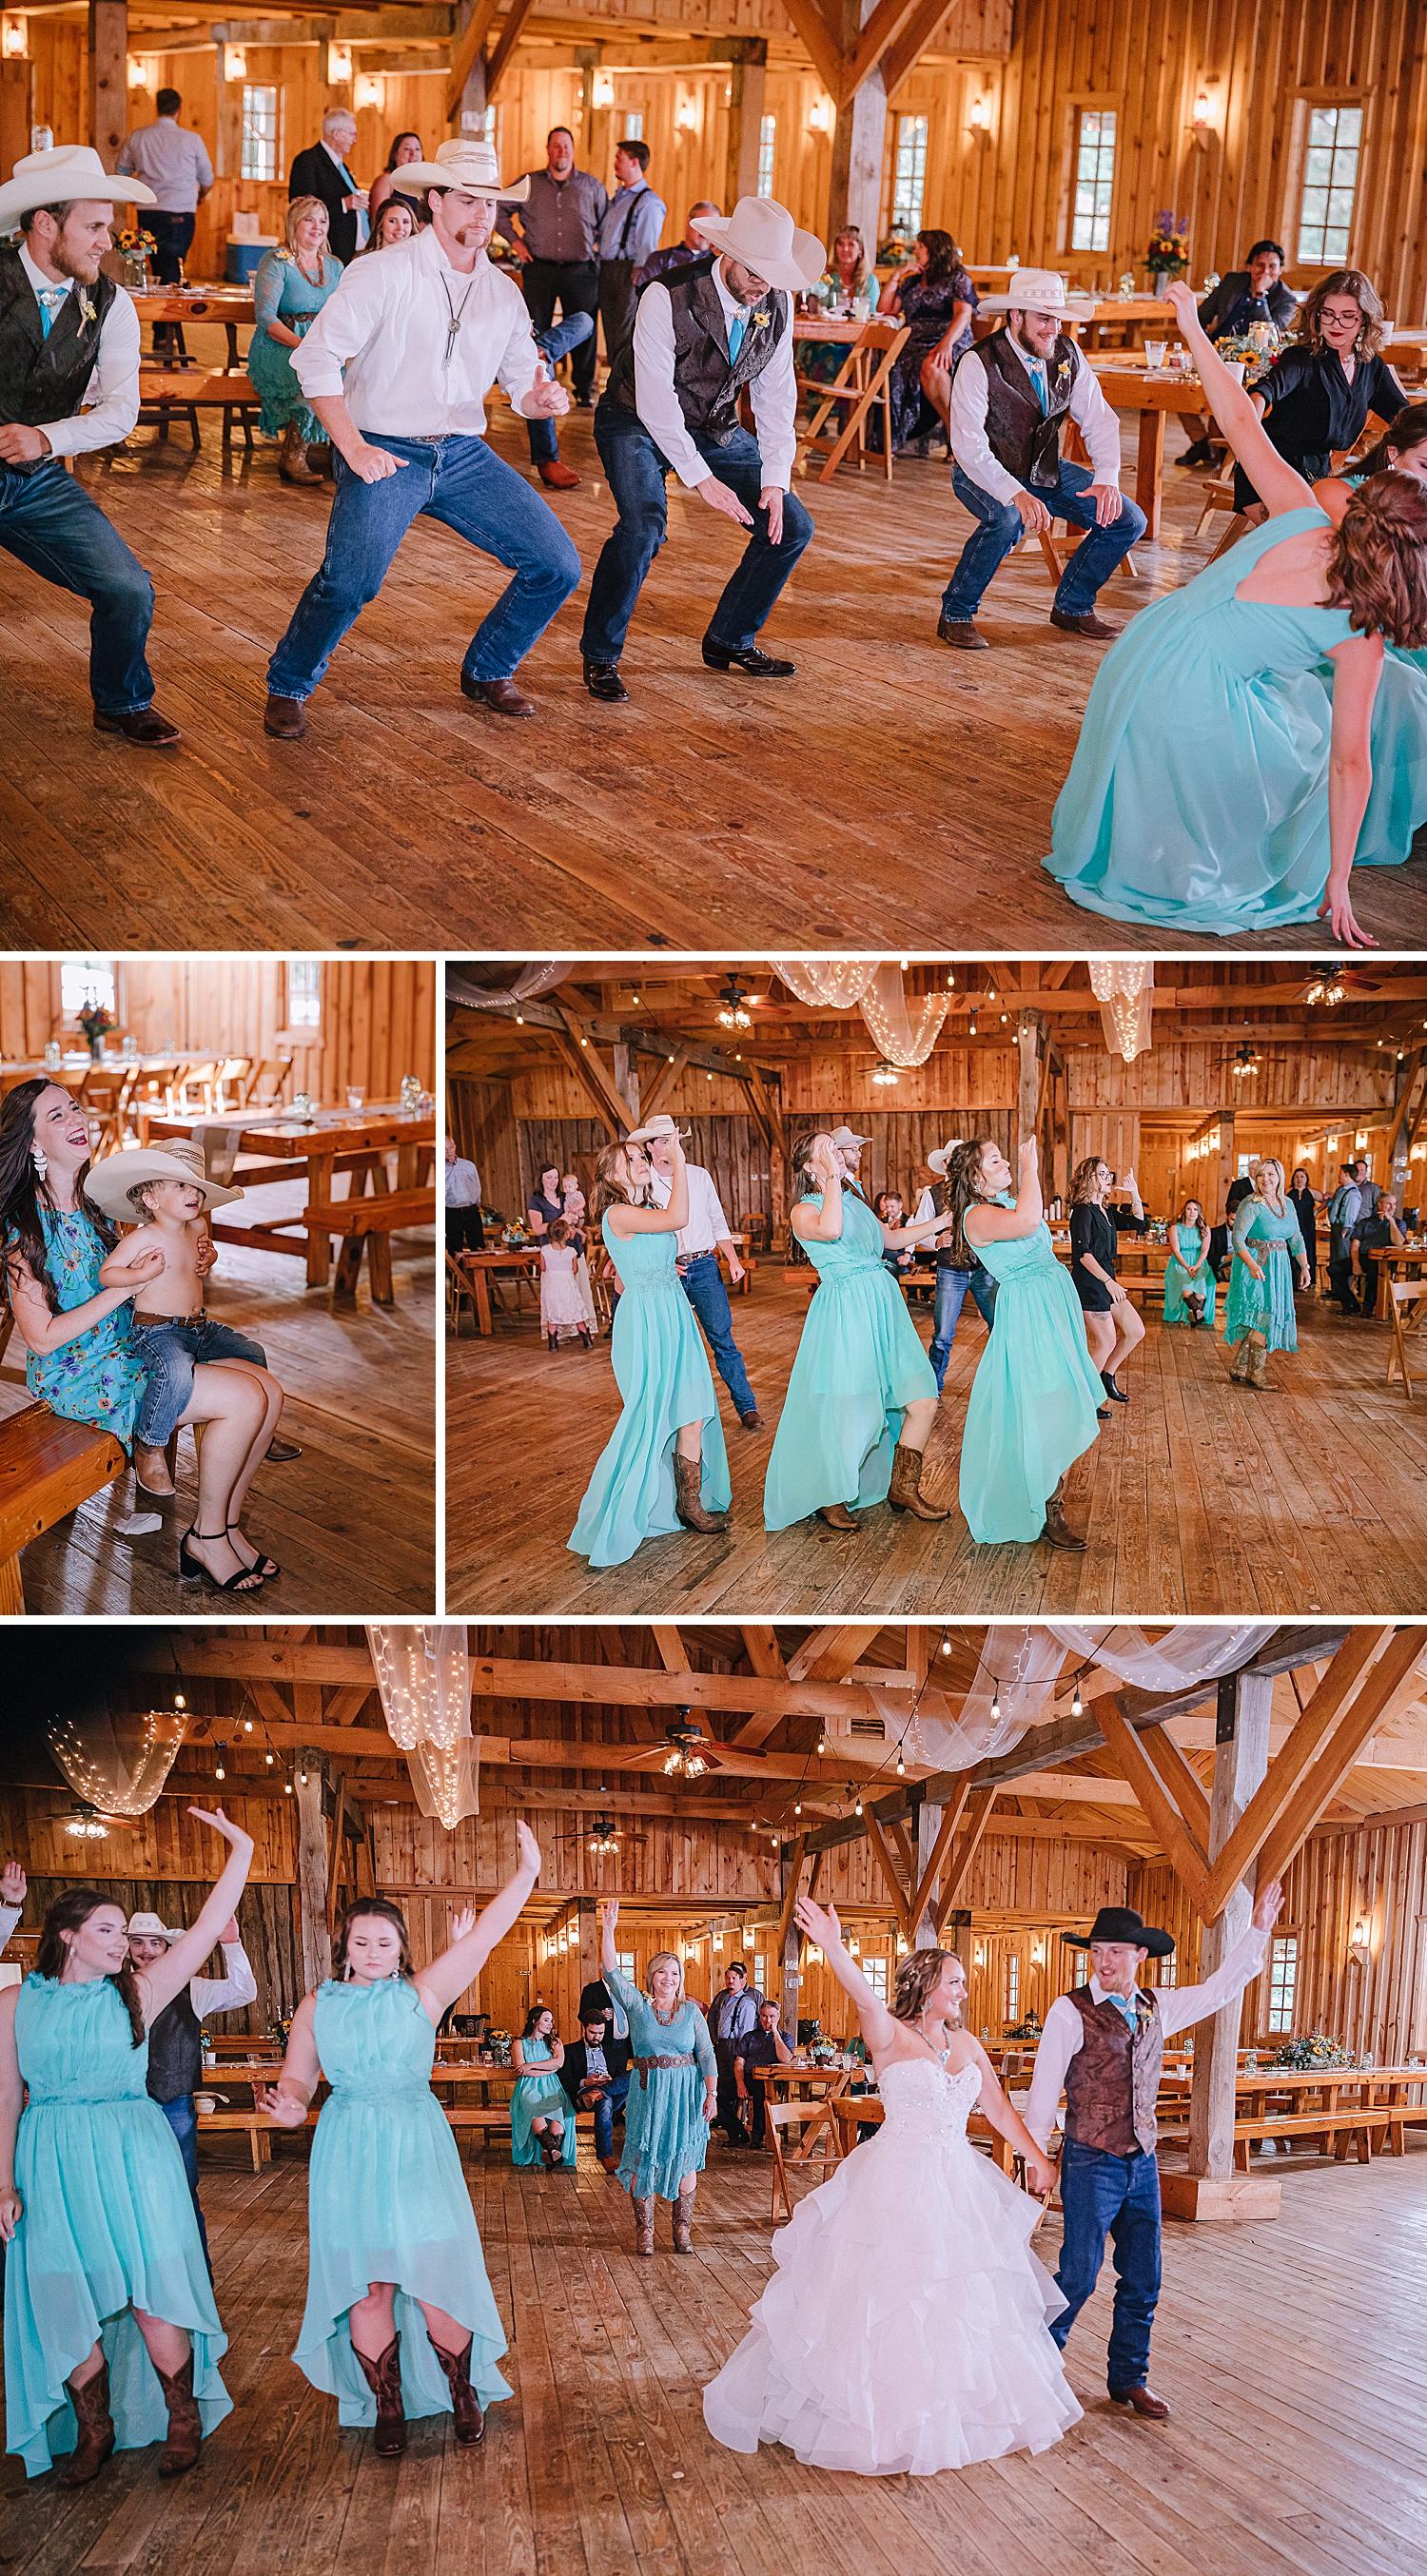 Carly-Barton-Photography-Old-Town-Texas-Rustic-Wedding-Photos-Sunflowers-Boots-Kyle-Texas_0103.jpg